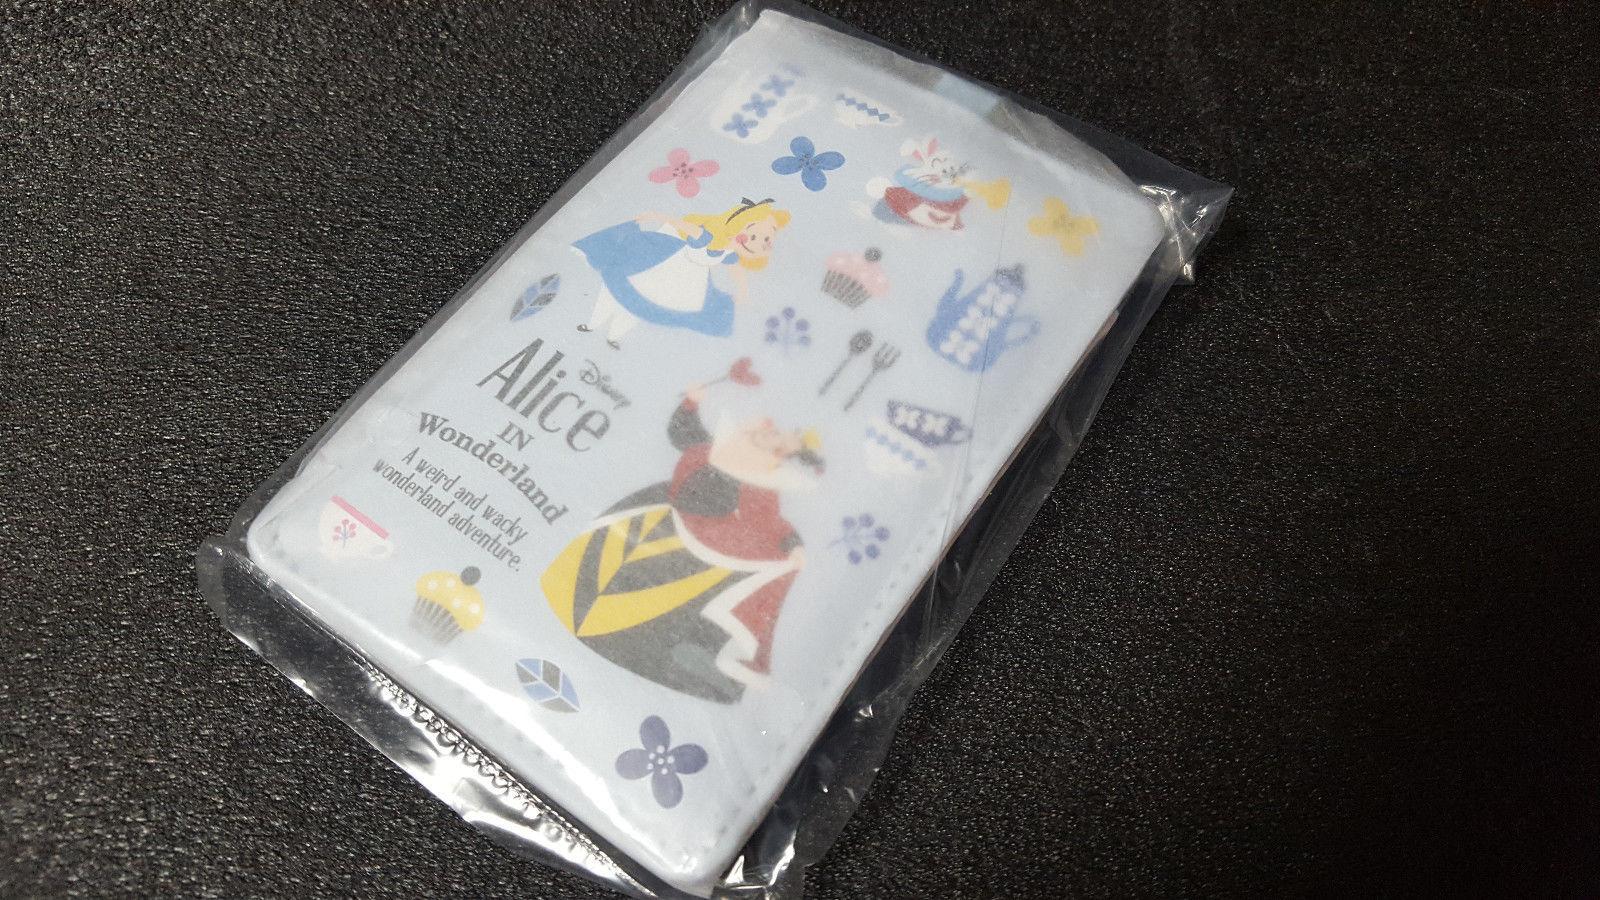 Alice in Wonderland Pass Case Storybook Disney Store Limited